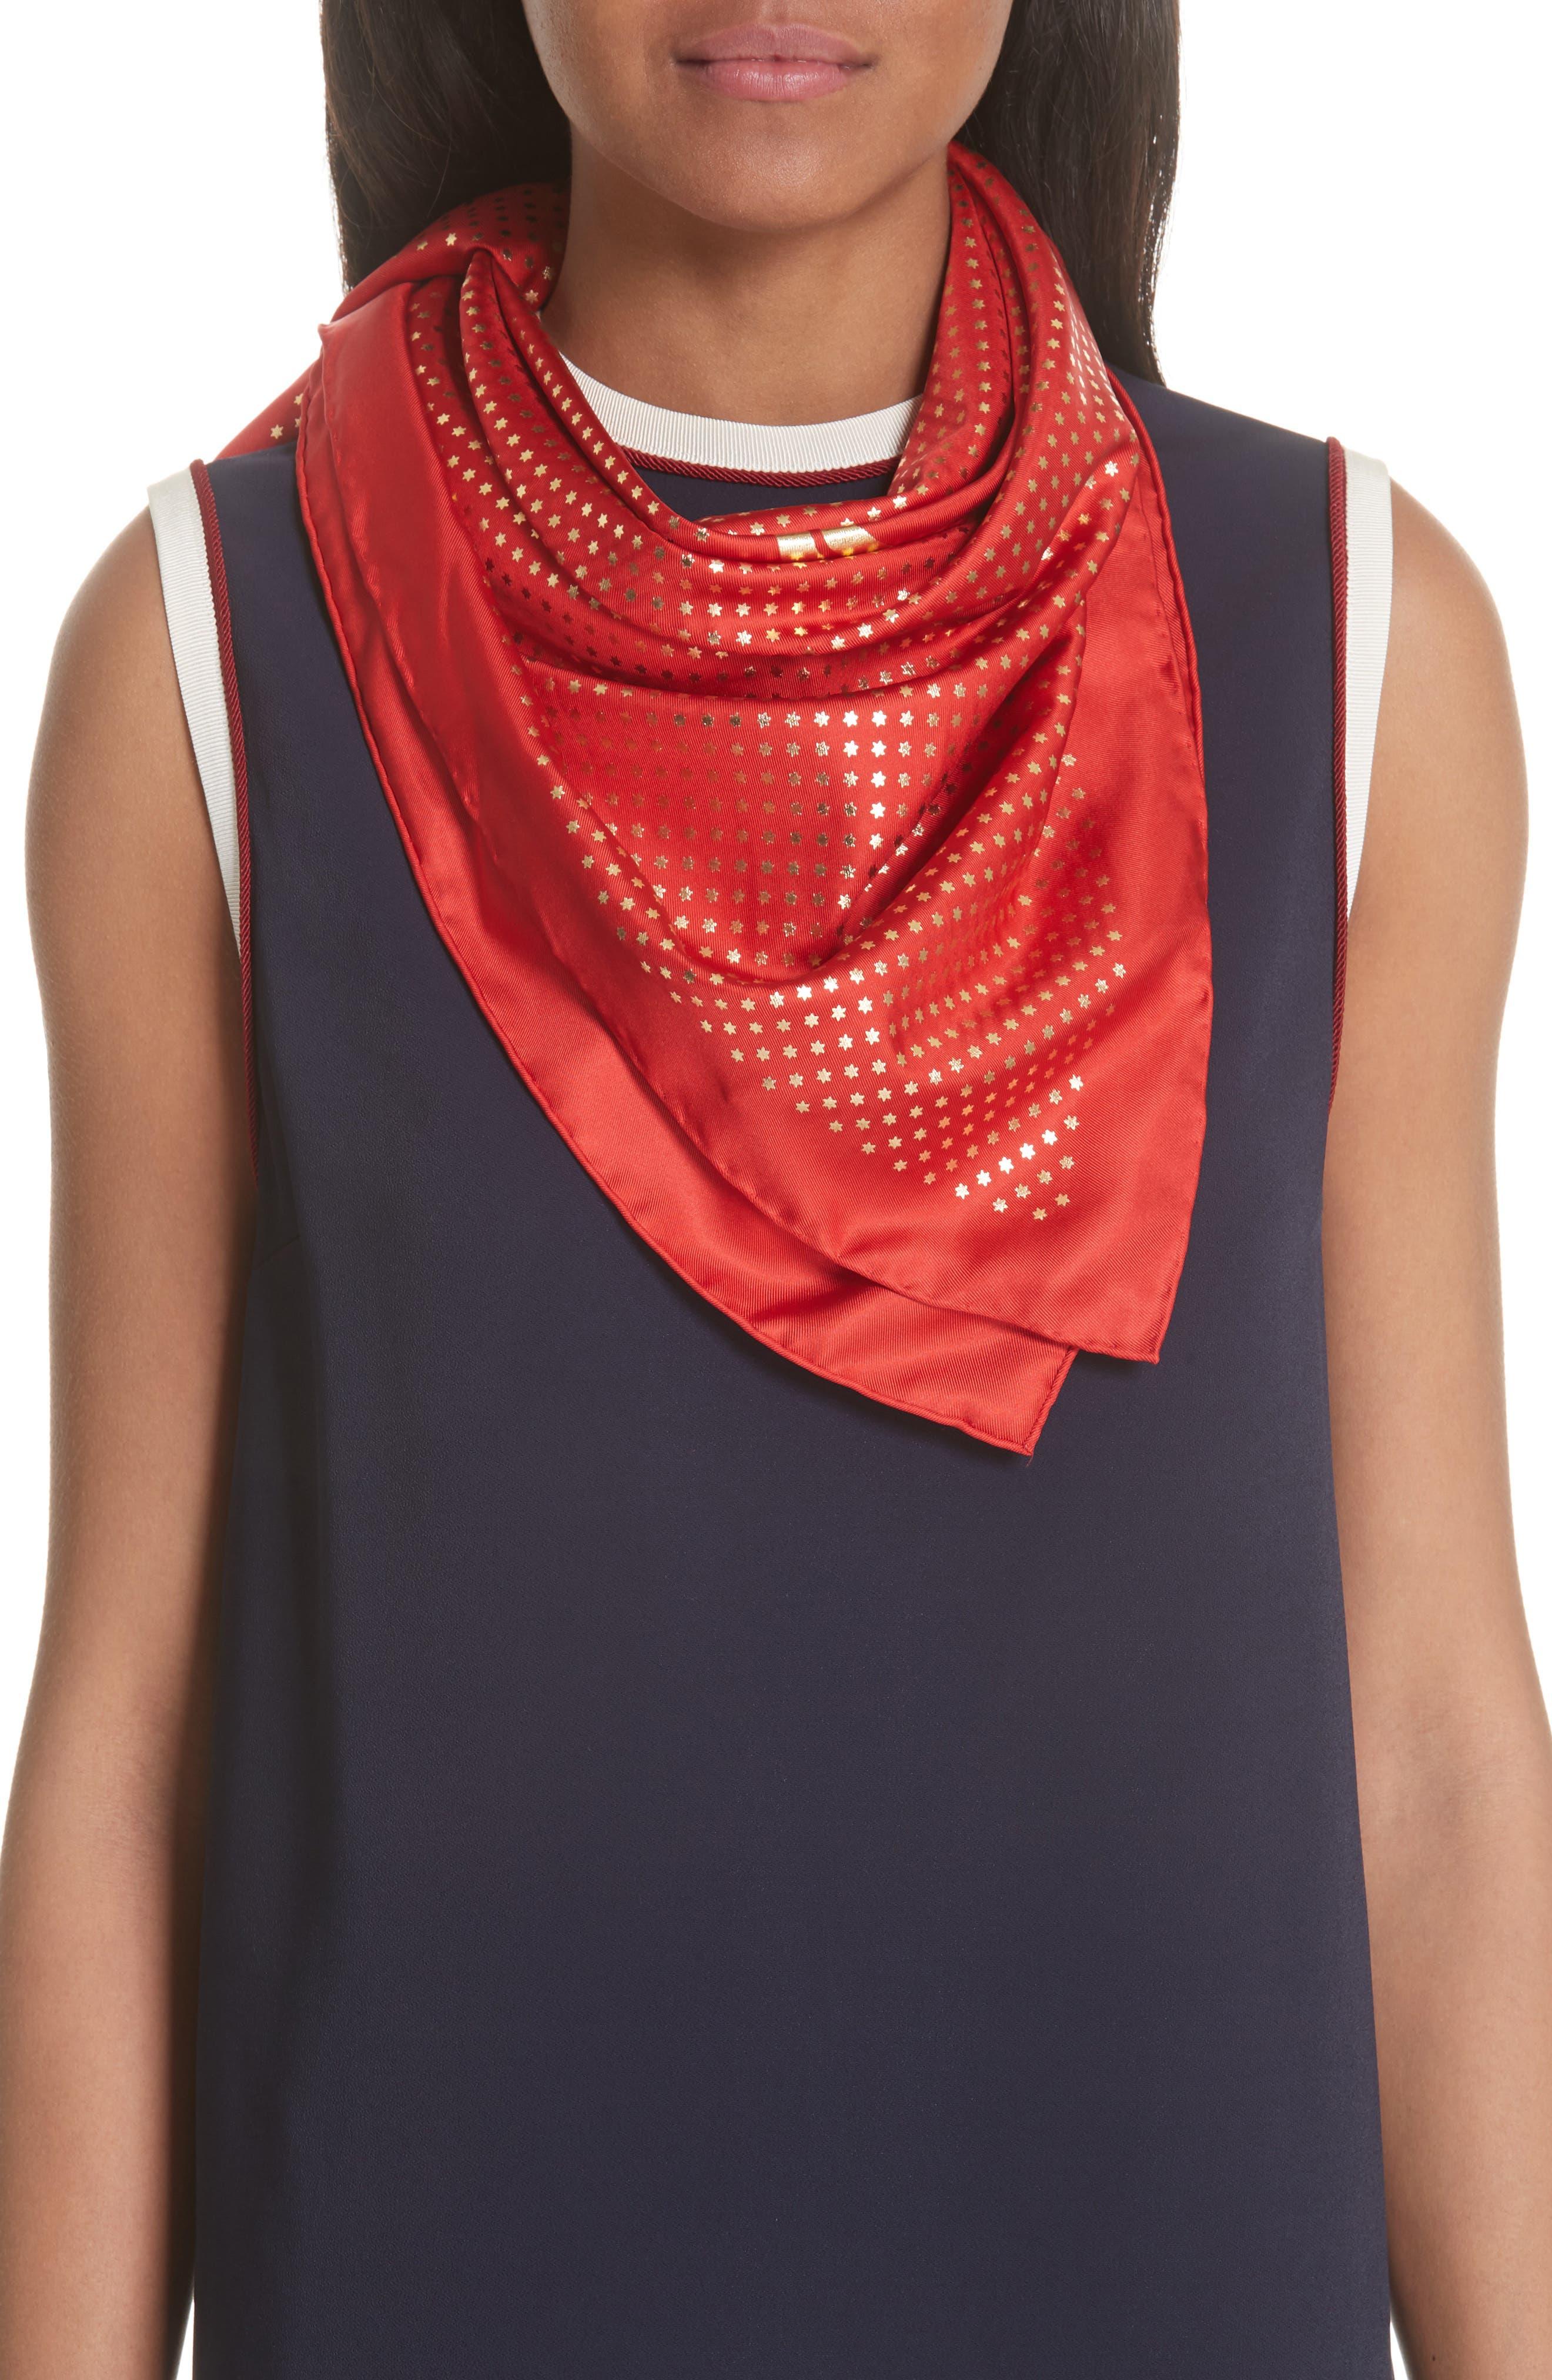 Guccy Star Foulard Silk Twill Scarf,                             Alternate thumbnail 2, color,                             Flame